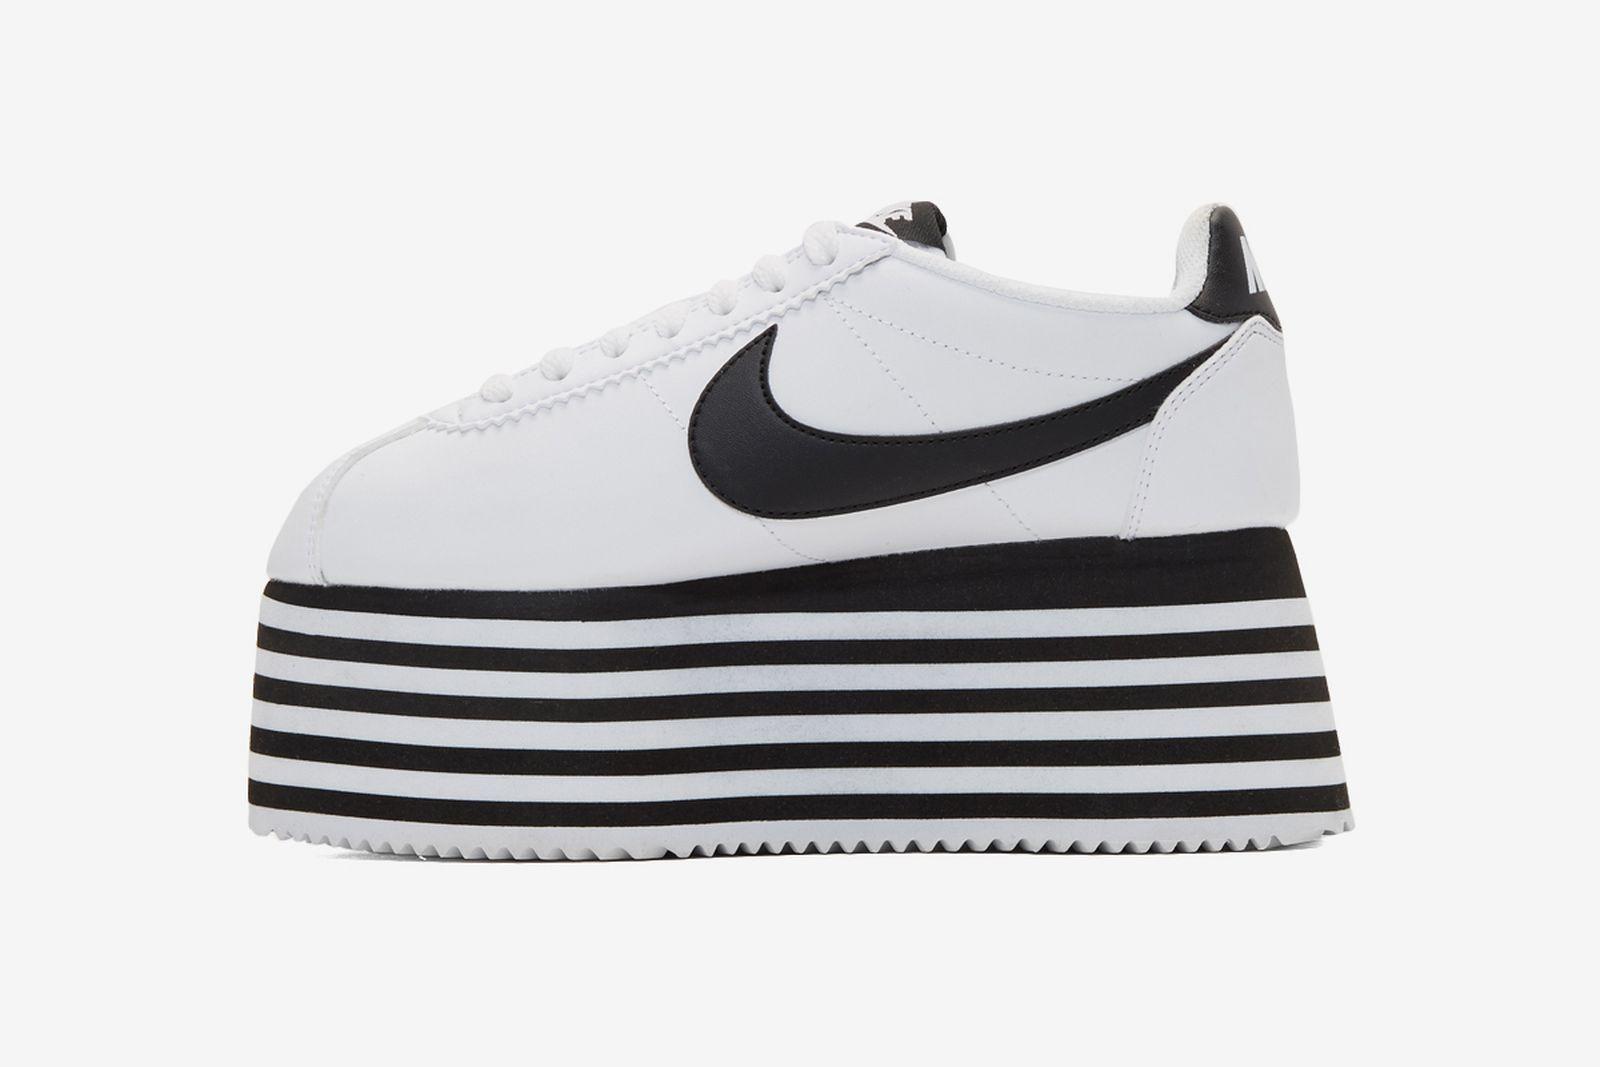 Oblicuo Ortodoxo boicotear  COMME des GARÇONS x Nike Cortez Platform: Release Date, Price & More Info